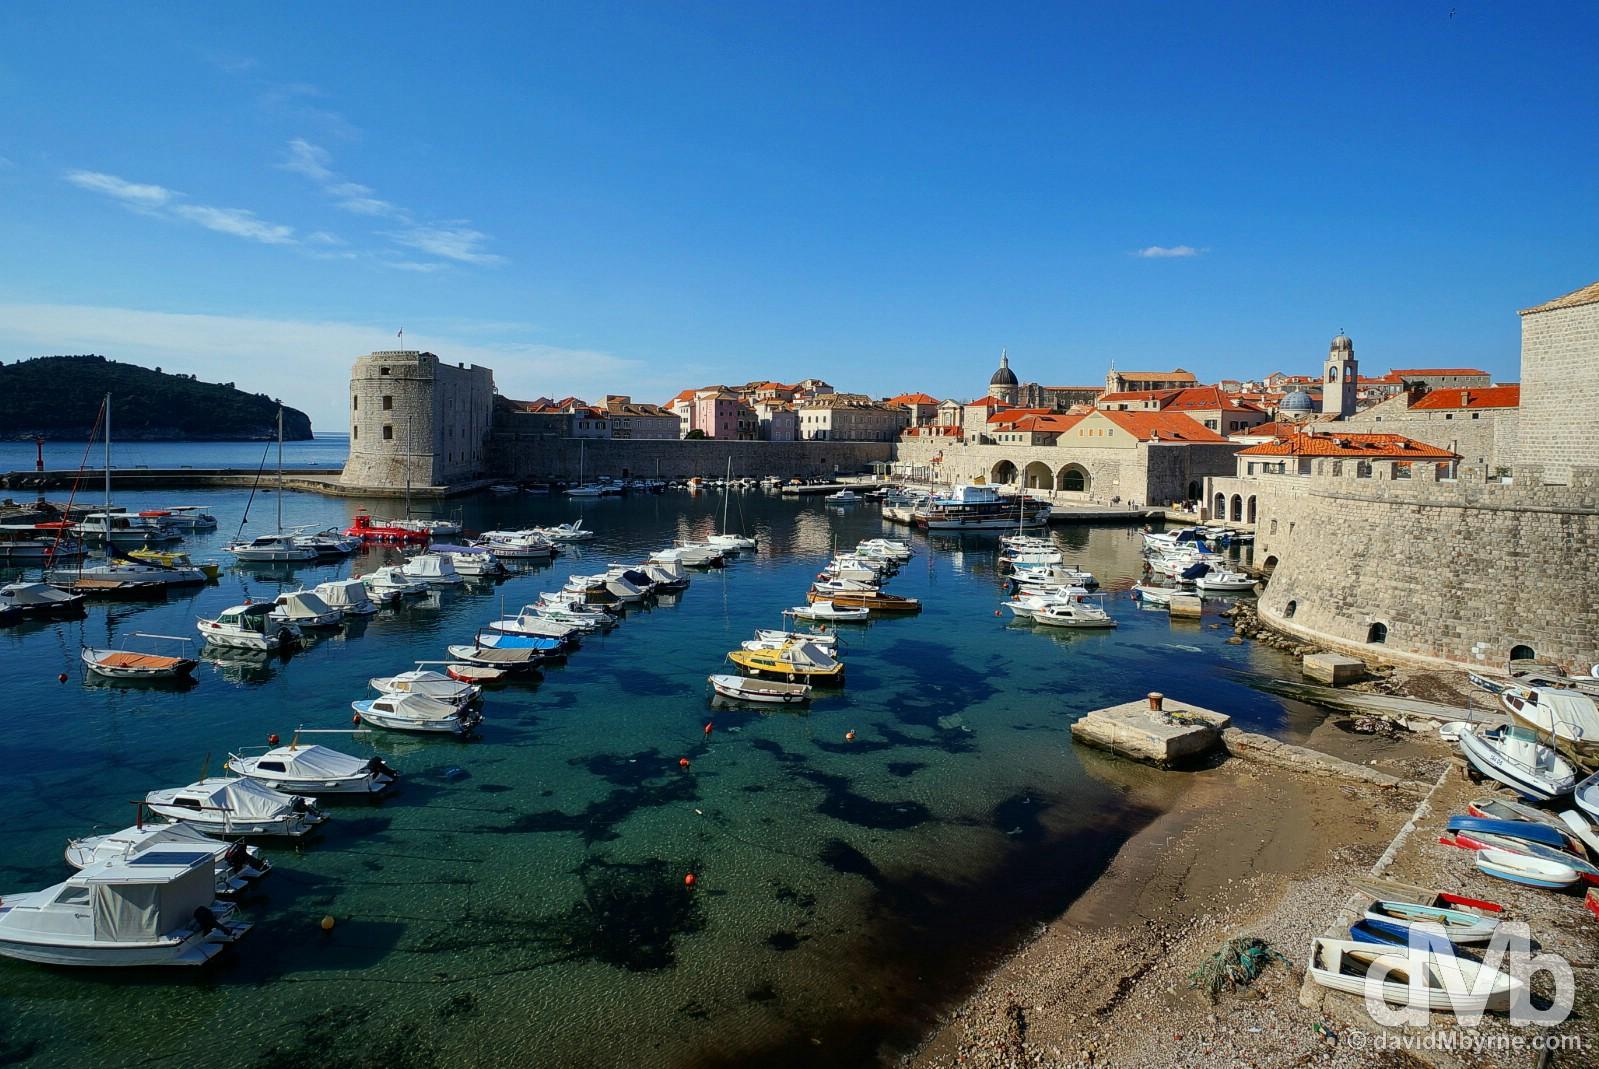 Old Harbour, Dubrovnik, Croatia. April 8, 2015.